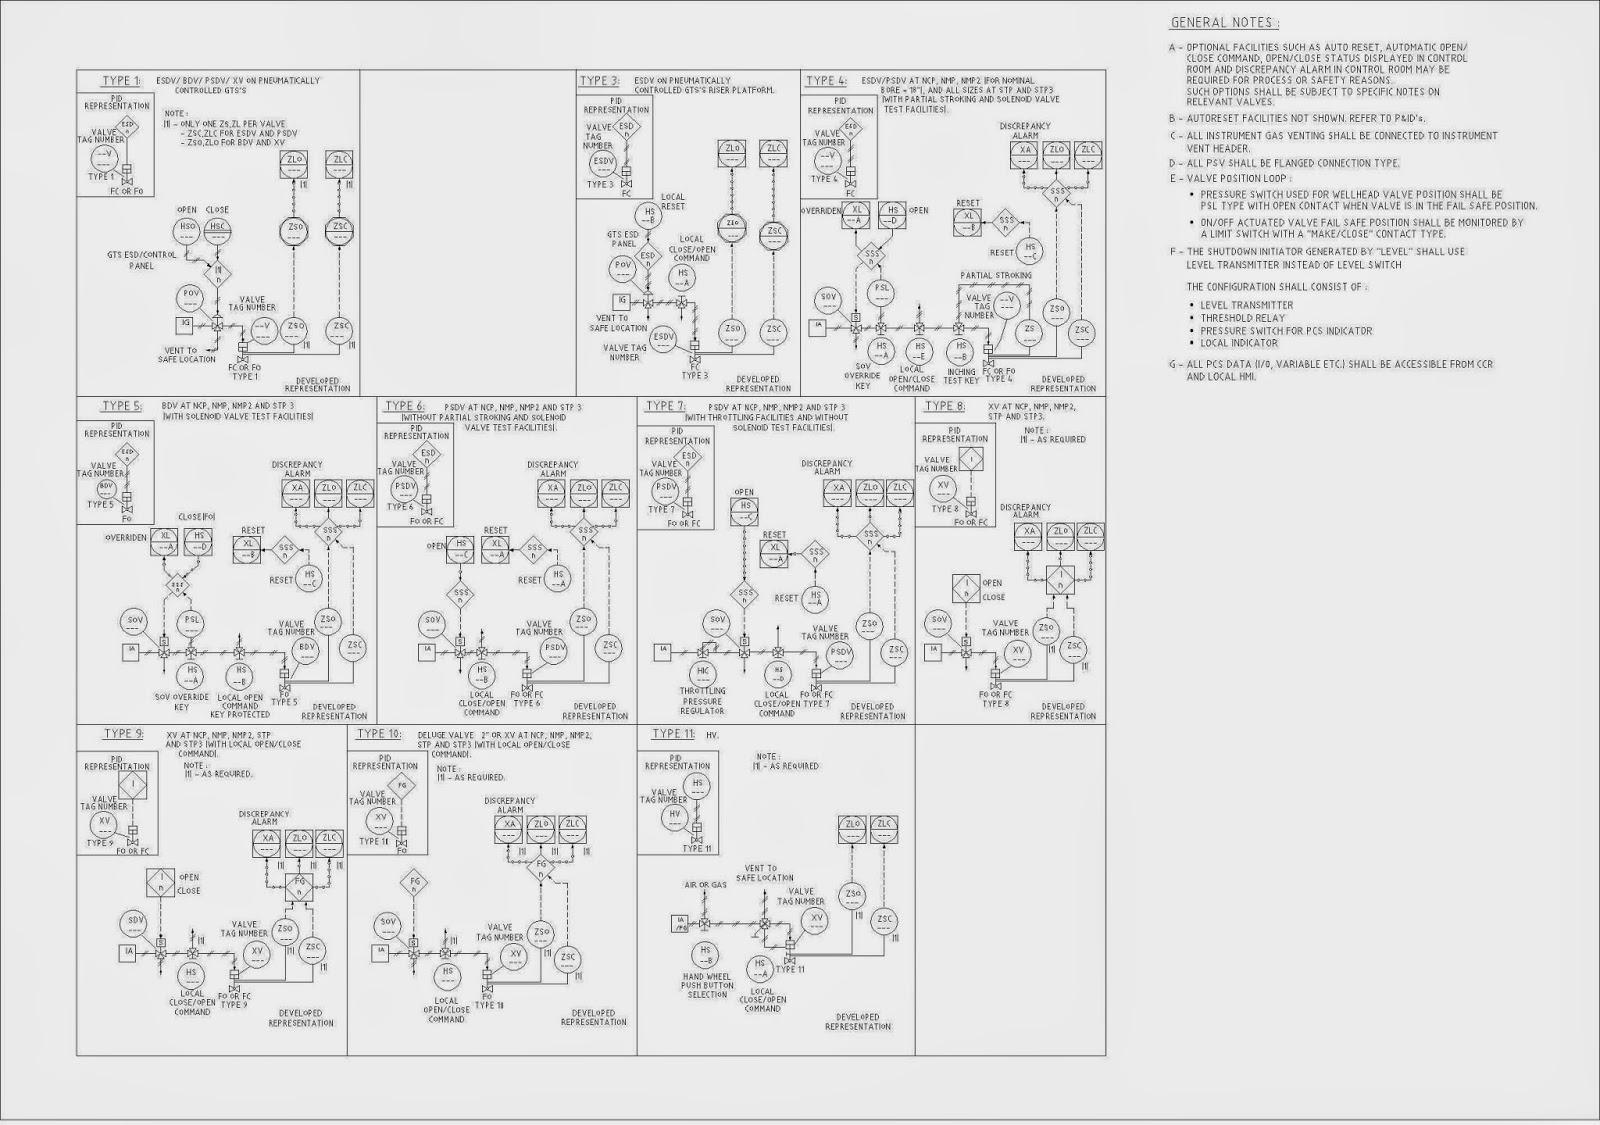 piping layout notes piping layout concepts